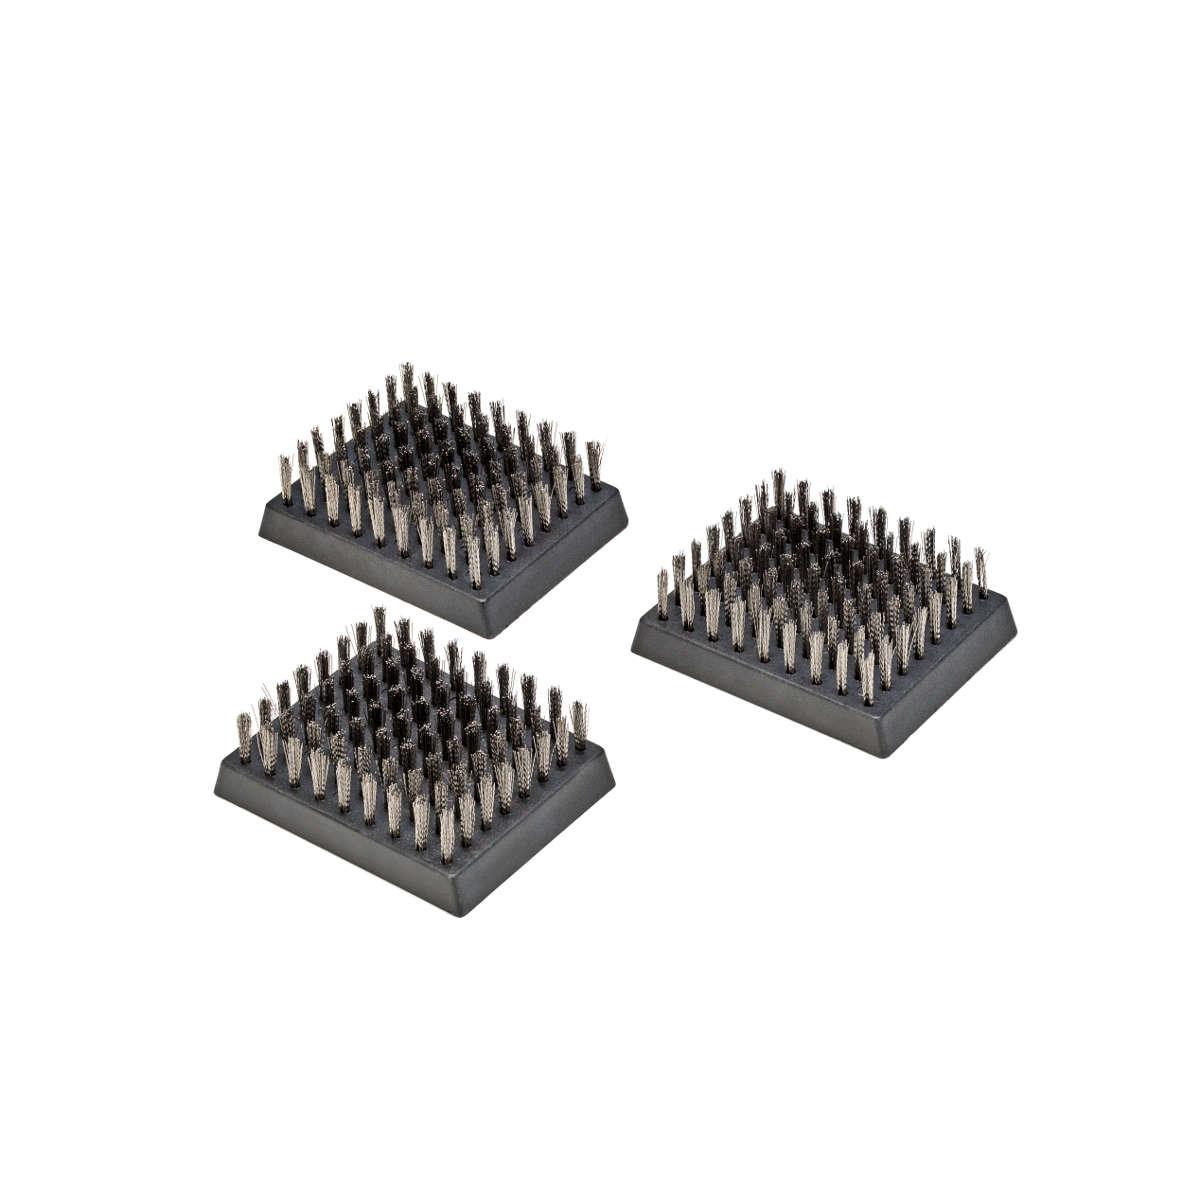 Ersatzbuersten-3er-Set-fuer-Grillbuerste-CLASSIC-57545-ohne-Verpackung